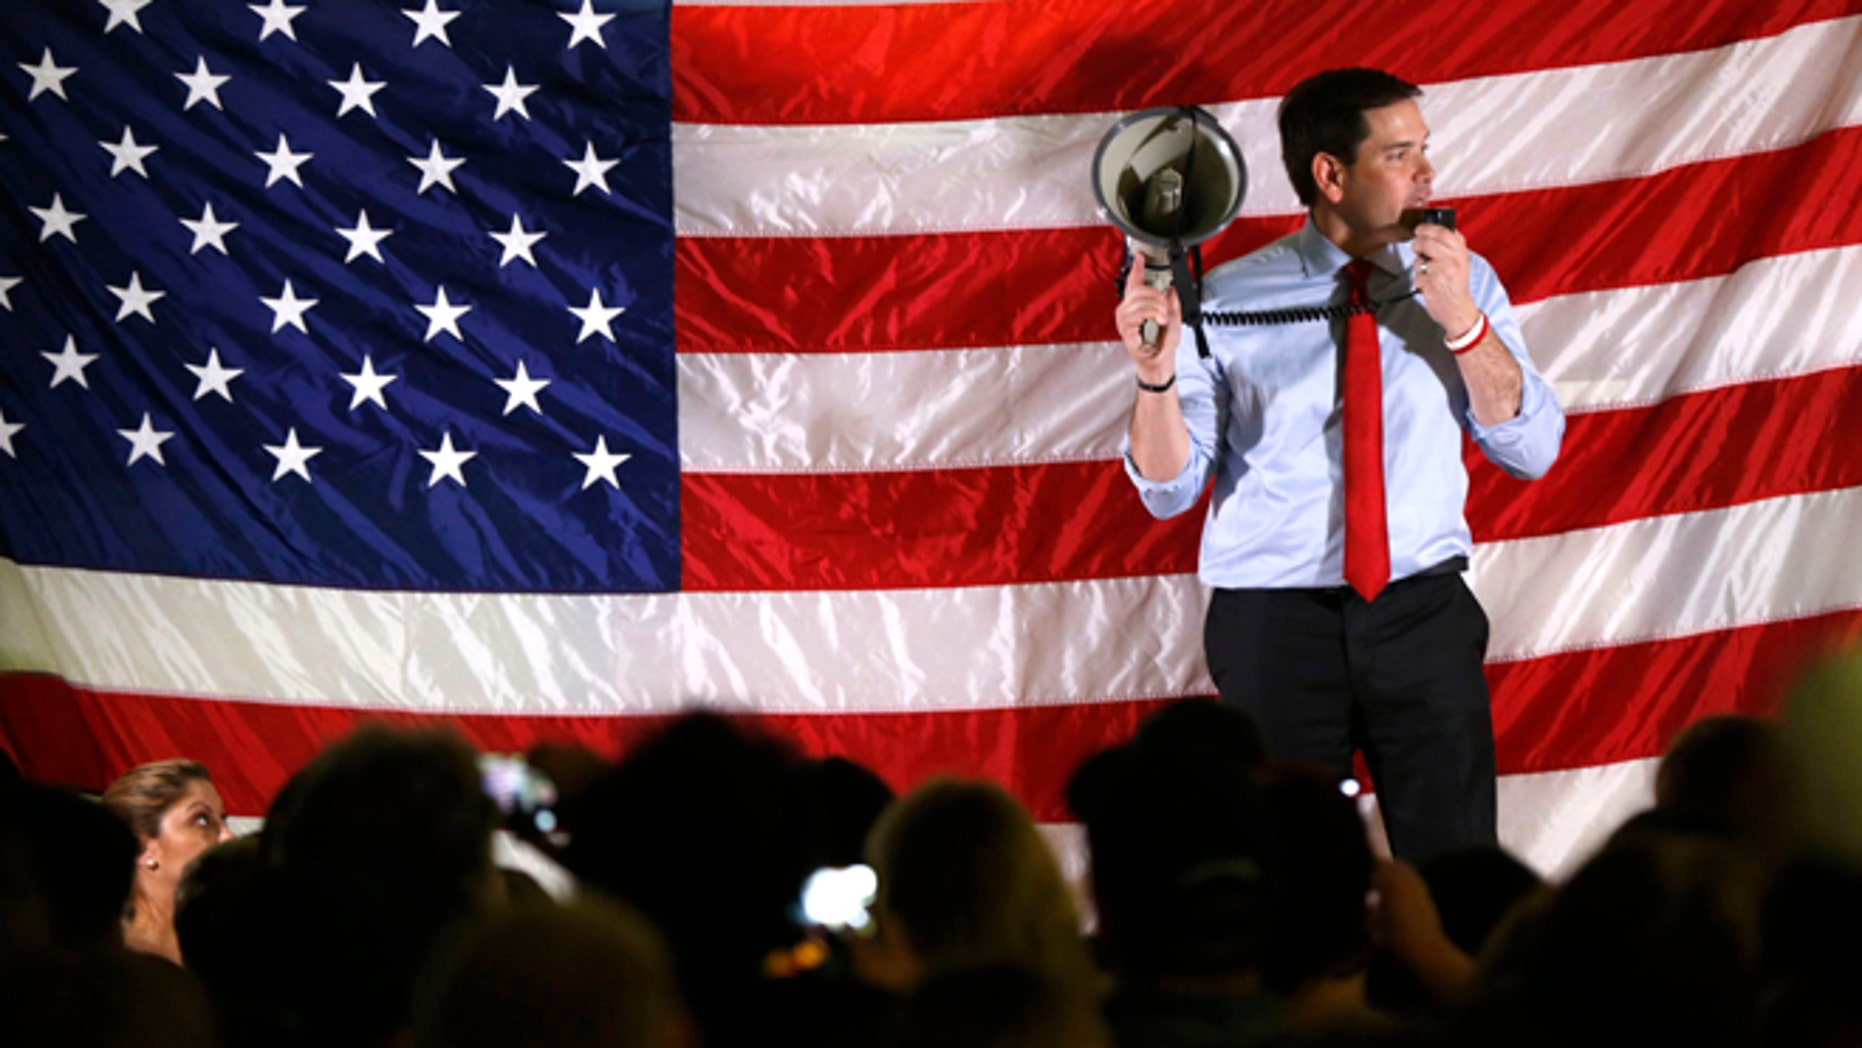 Republican presidential candidate Sen. Marco Rubio in Orlando, Fla., Sunday, March 13, 2016.